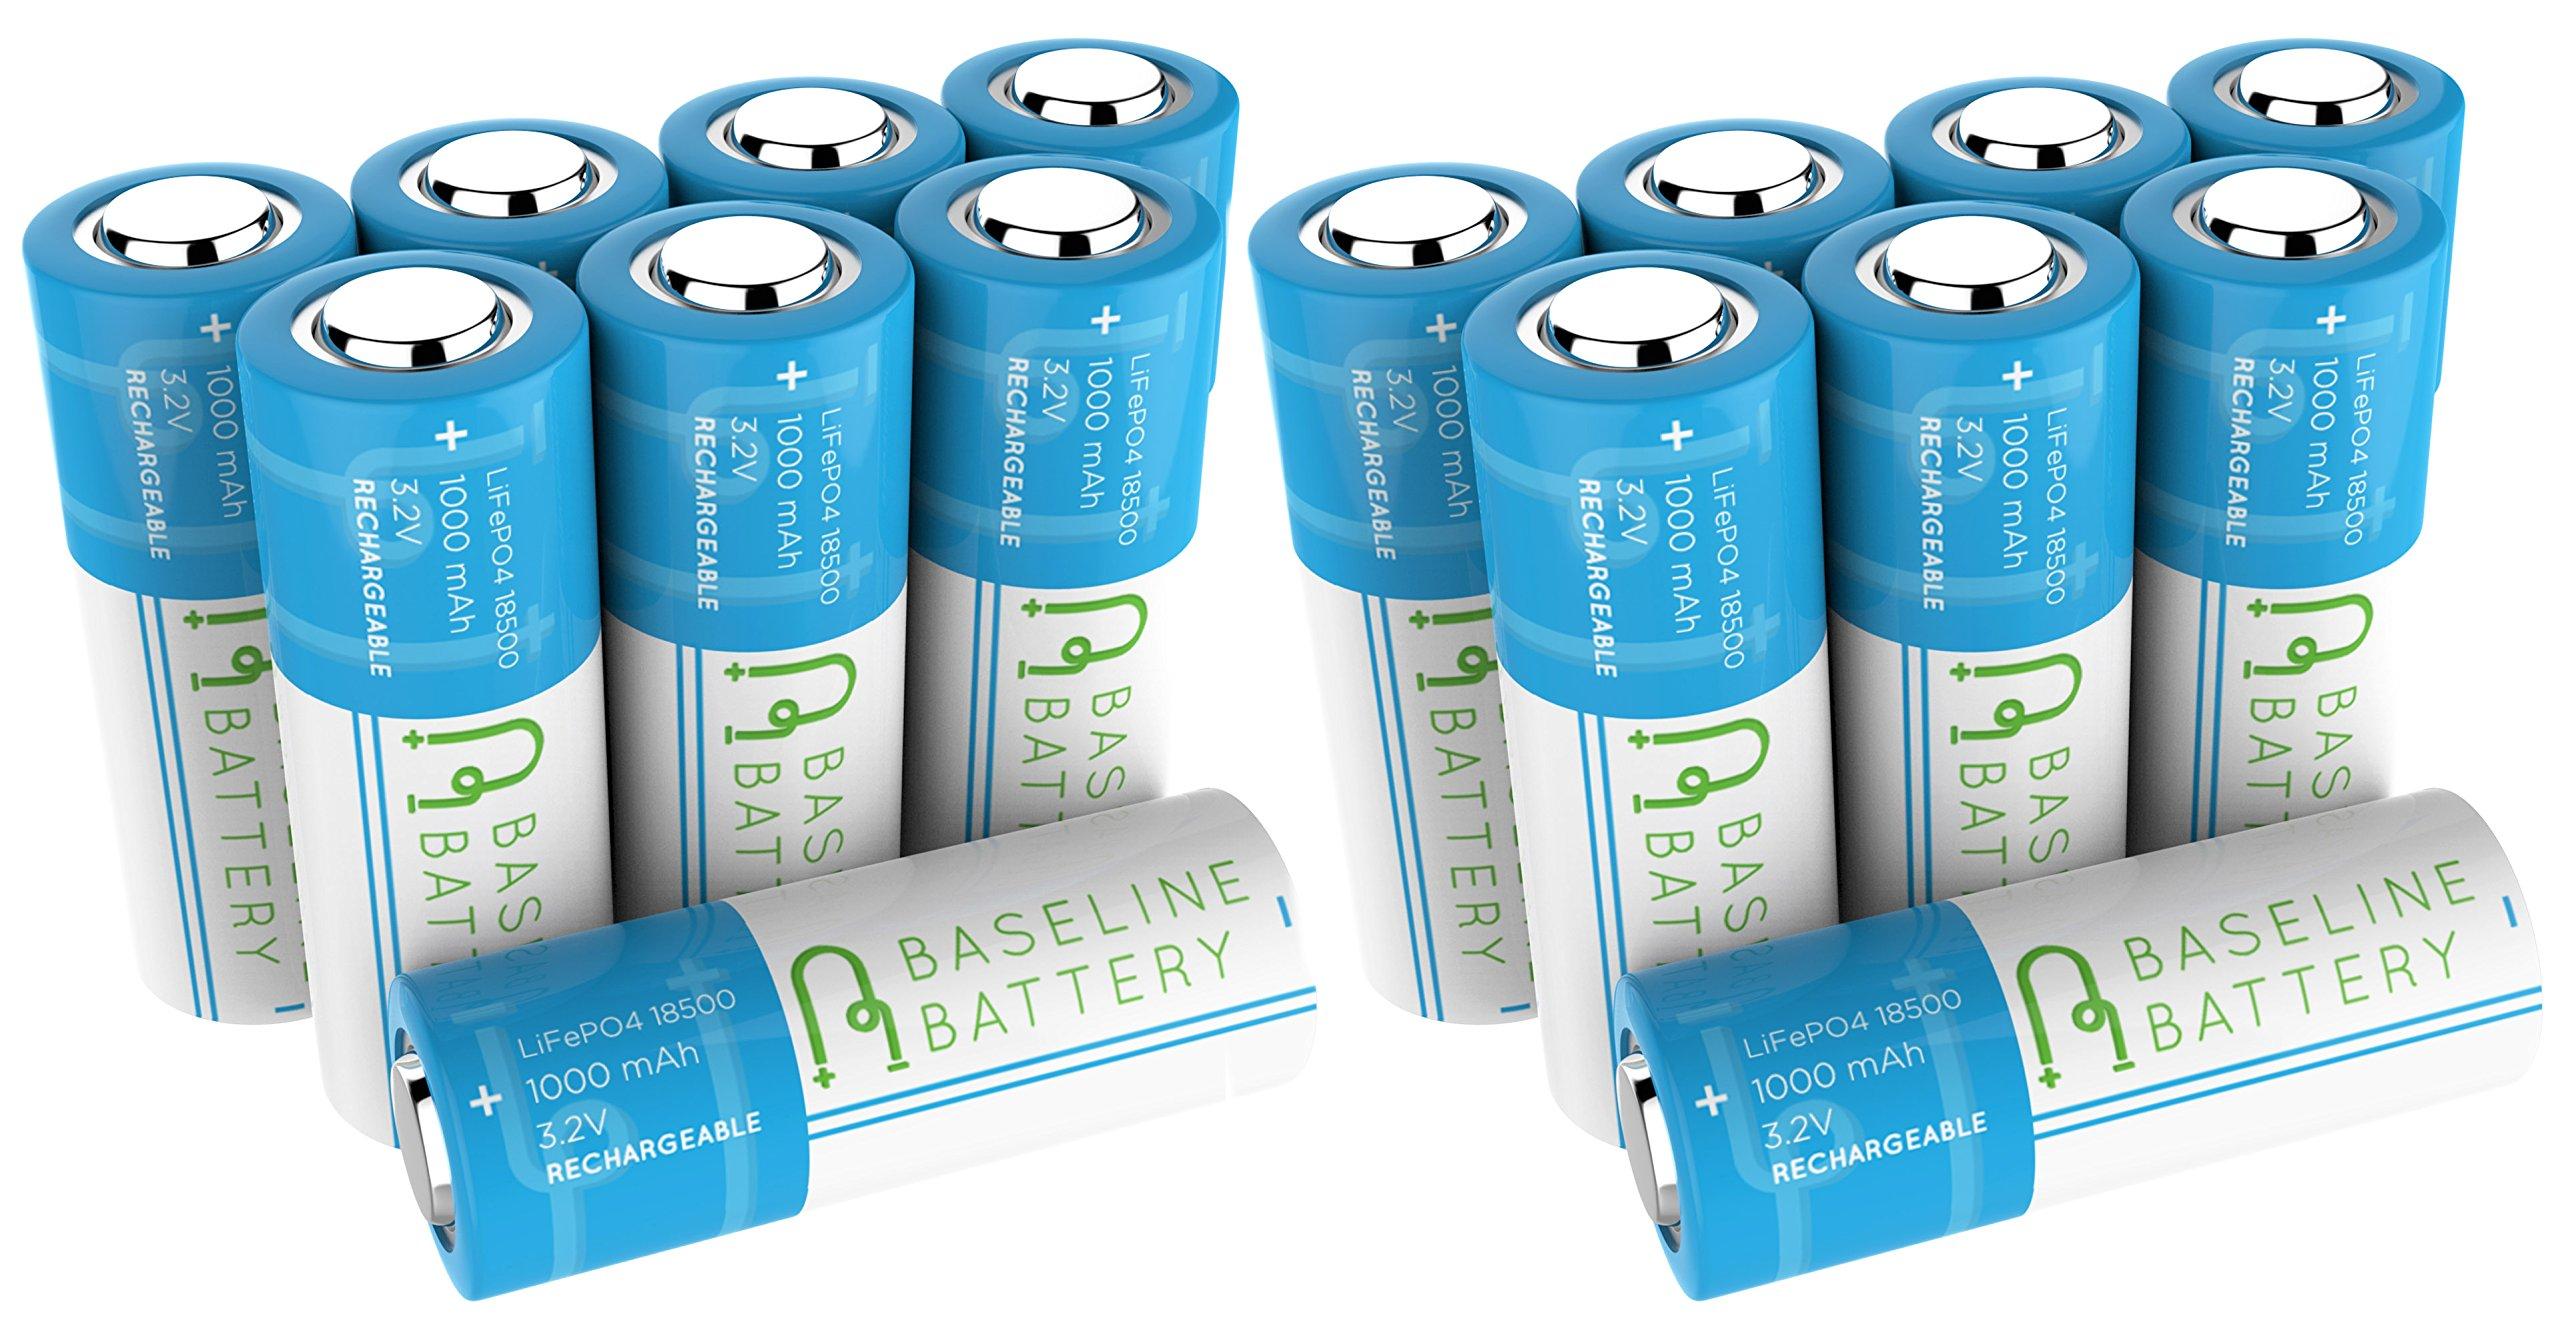 16 Baseline Battery 1000 mAh IFR 18500 3.2v LiFePO4 Lithium Phosphate Rechargeable Batteries Solar Garden Light